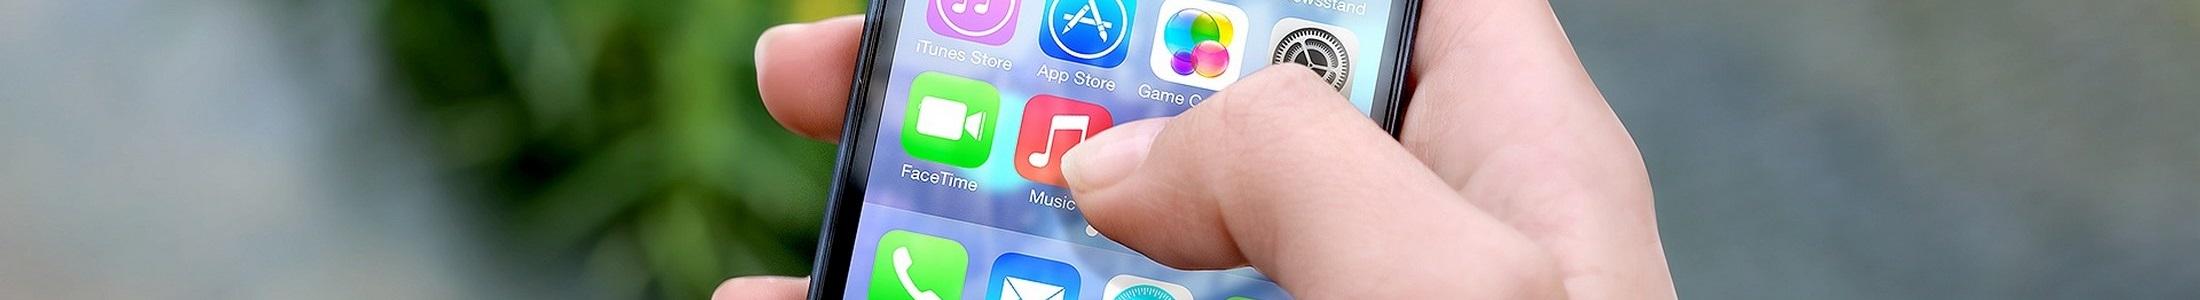 app sharepoint